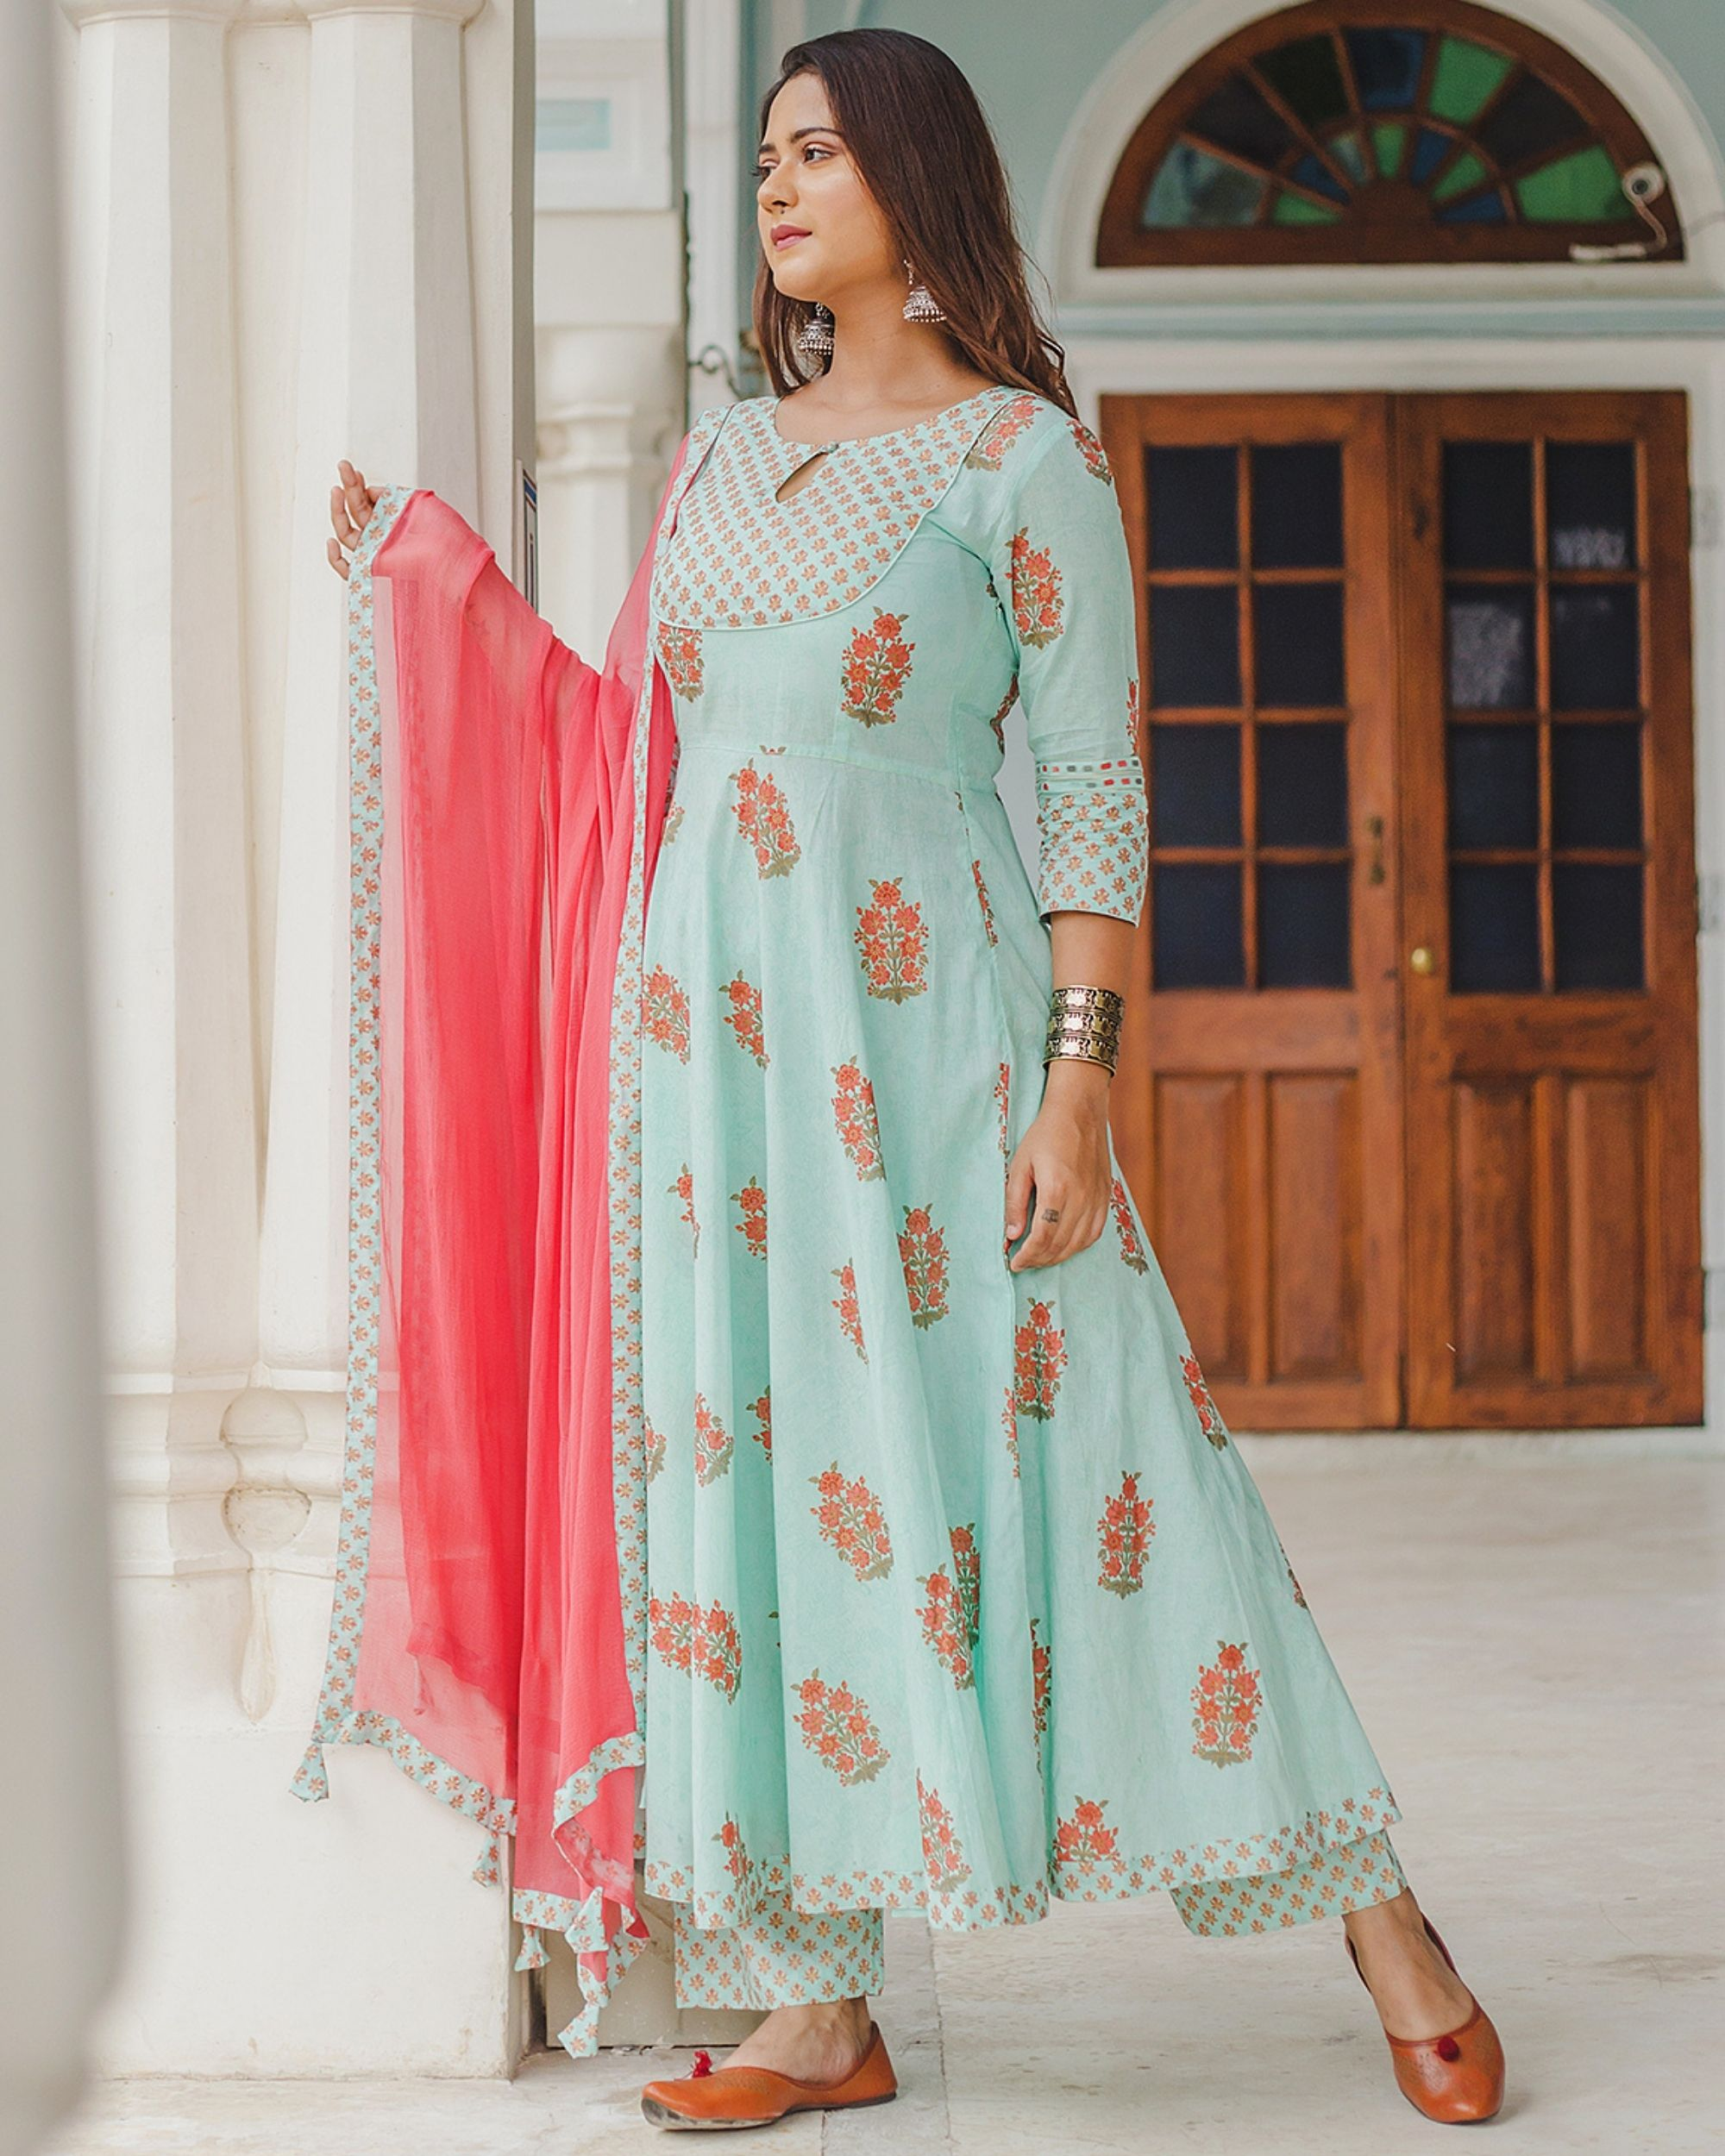 Pastel blue mughal dress set with dupatta - set of three